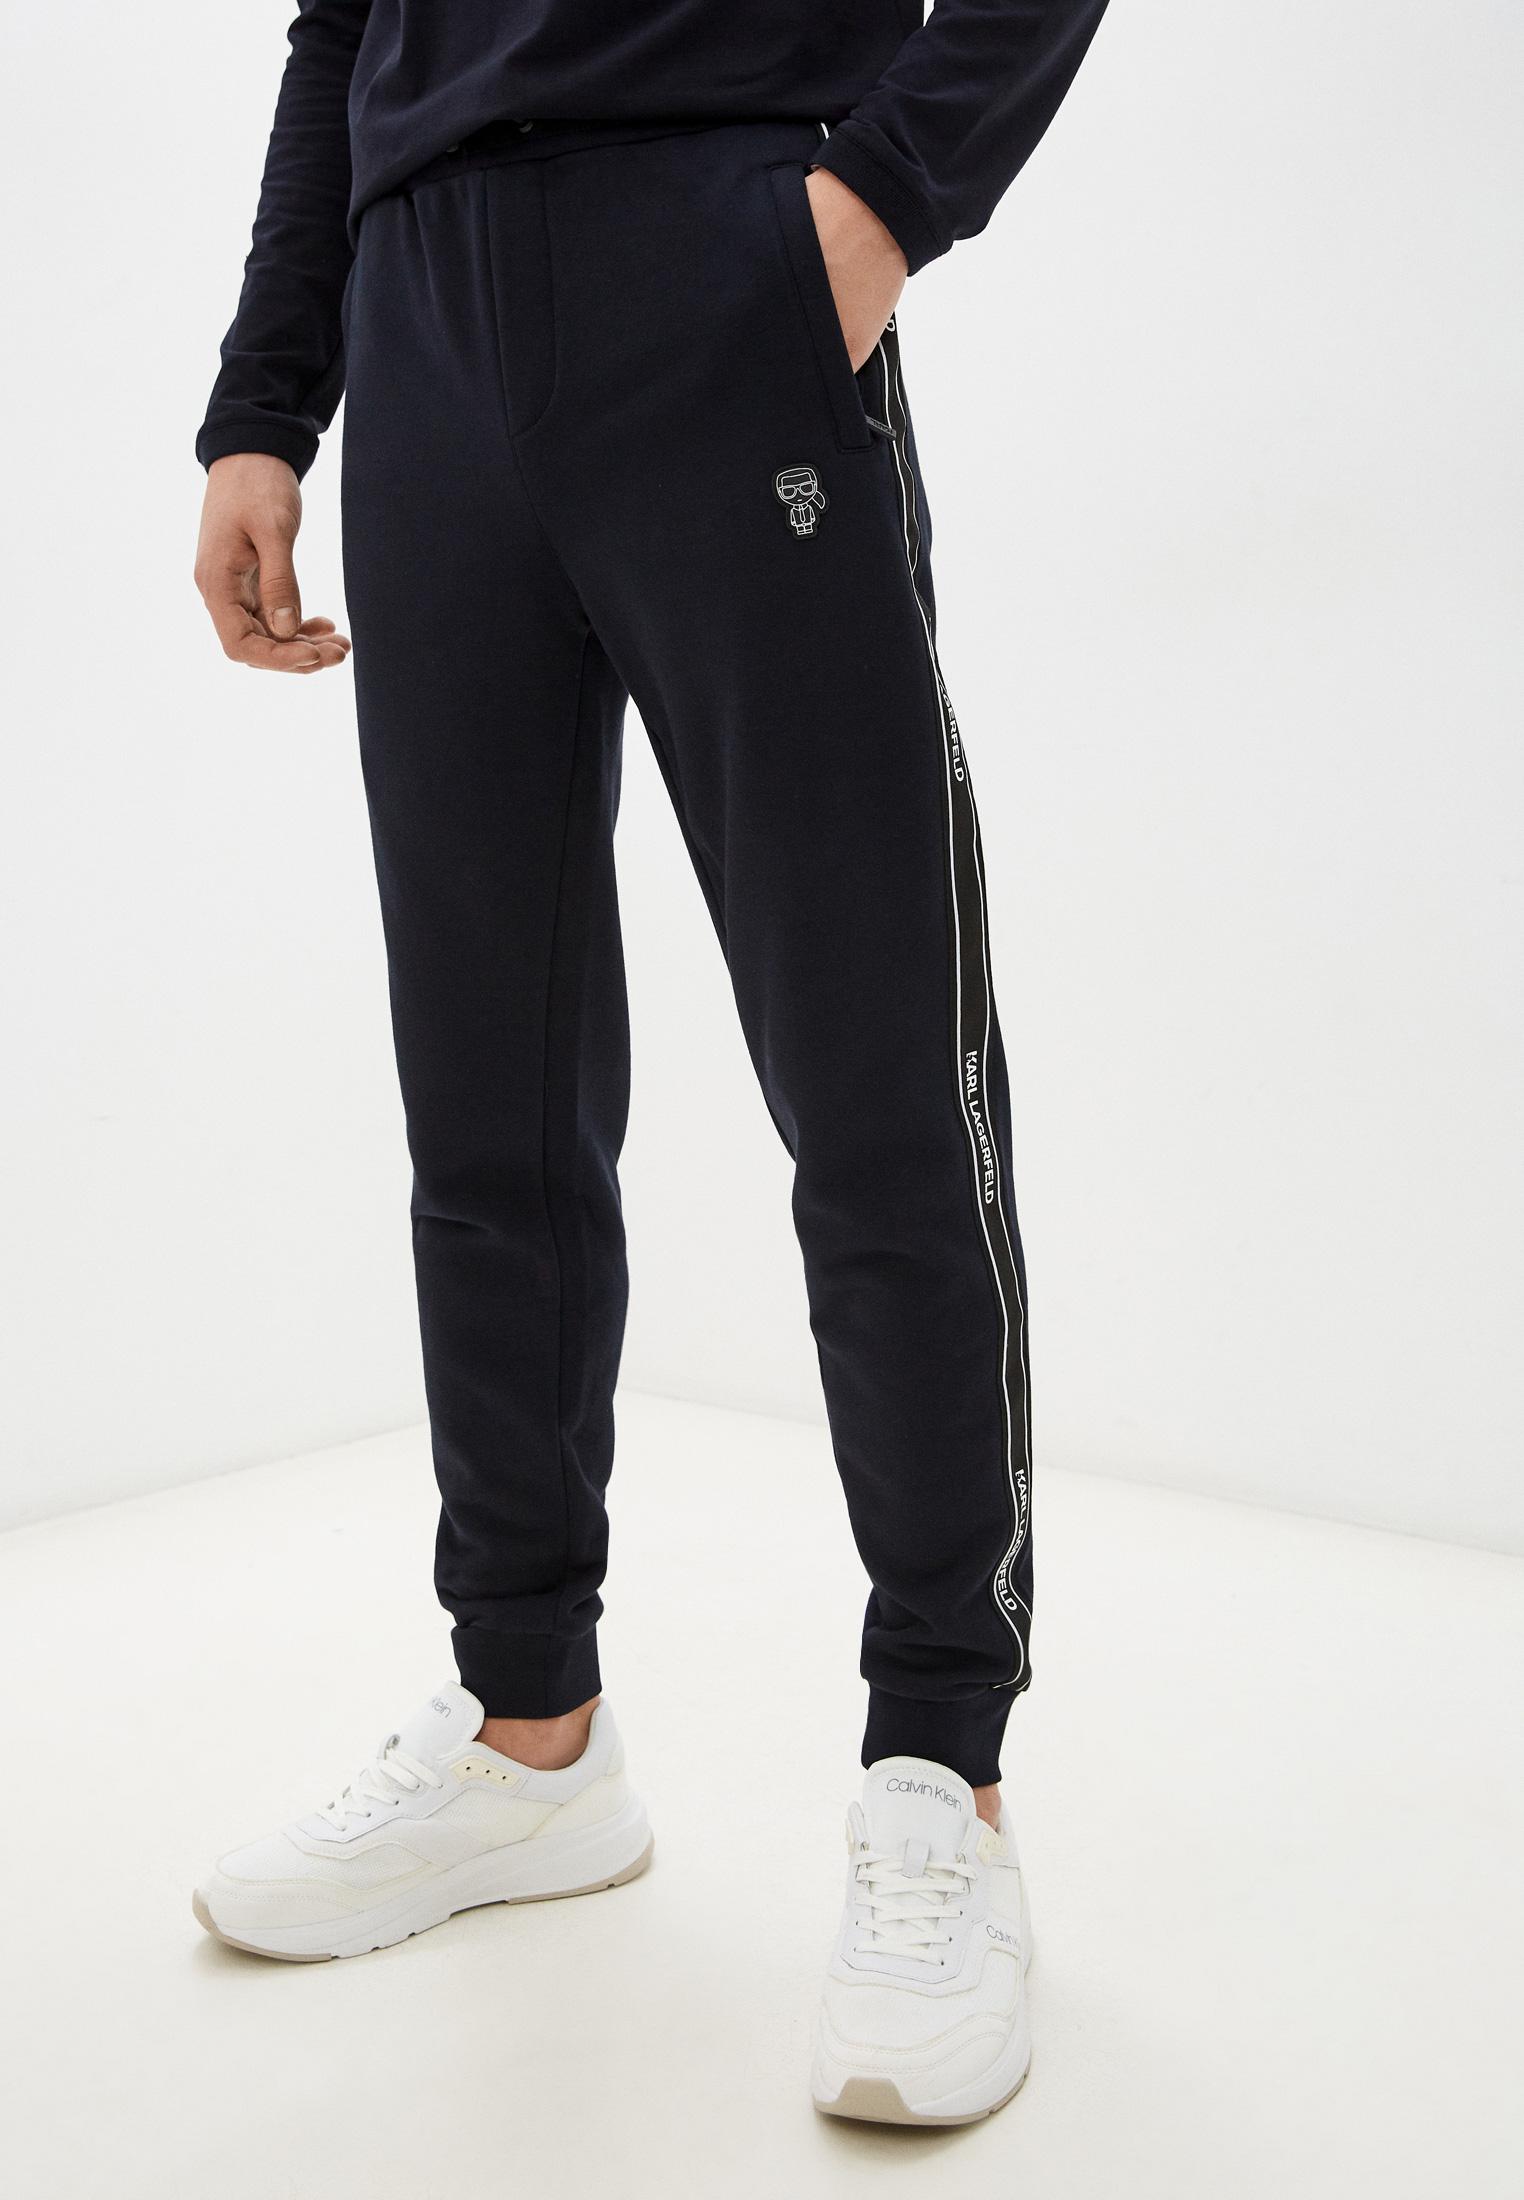 Мужские спортивные брюки Karl Lagerfeld (Карл Лагерфельд) 512910-705028